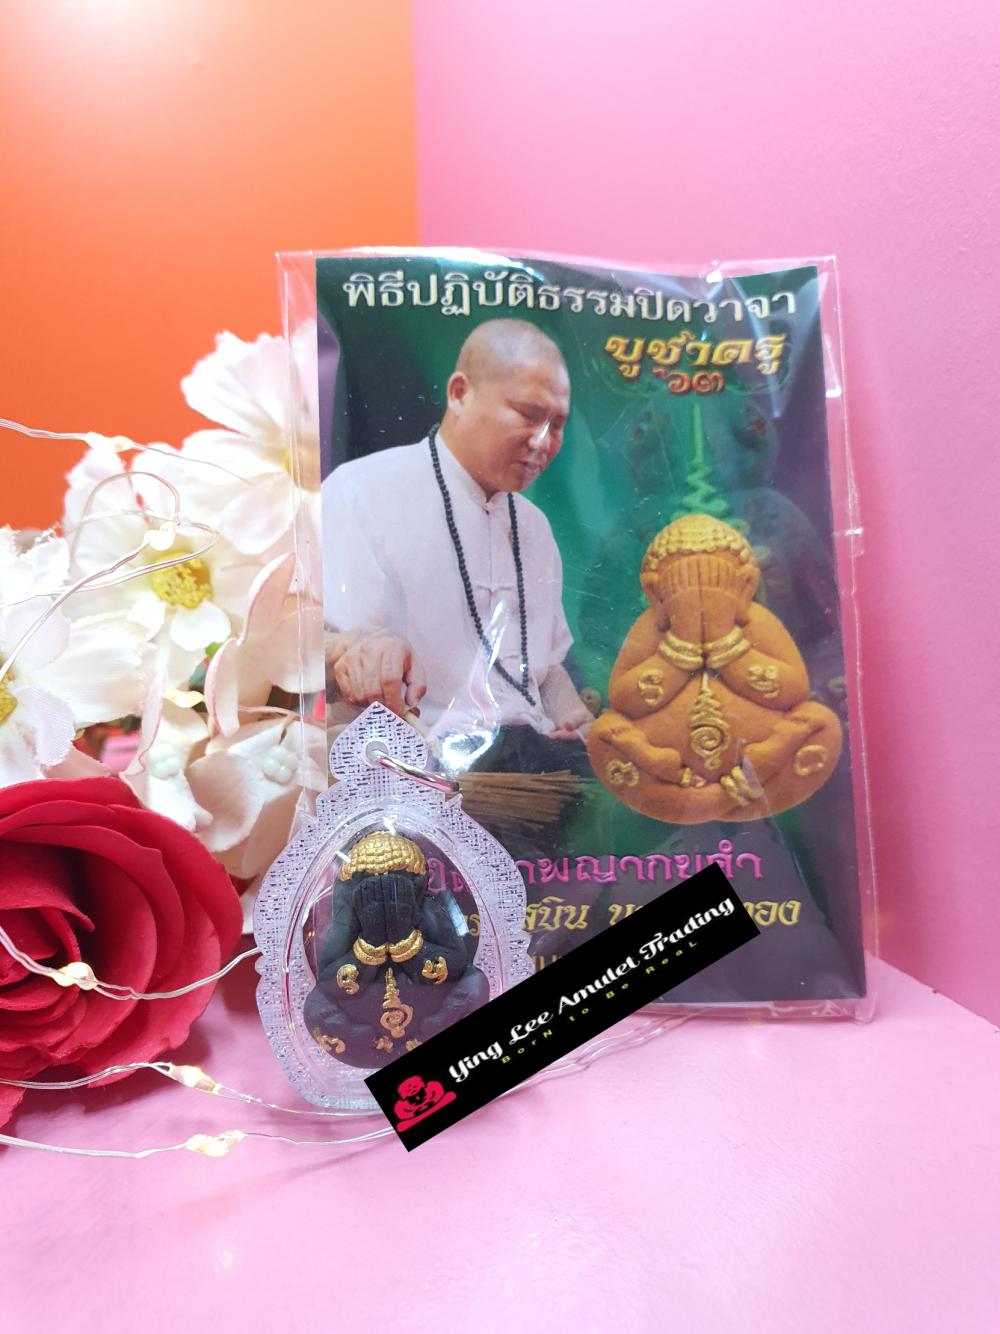 Phra Pidta# Roon Sao Har# Lang Wealthy Frog# Archan Subin BE2563